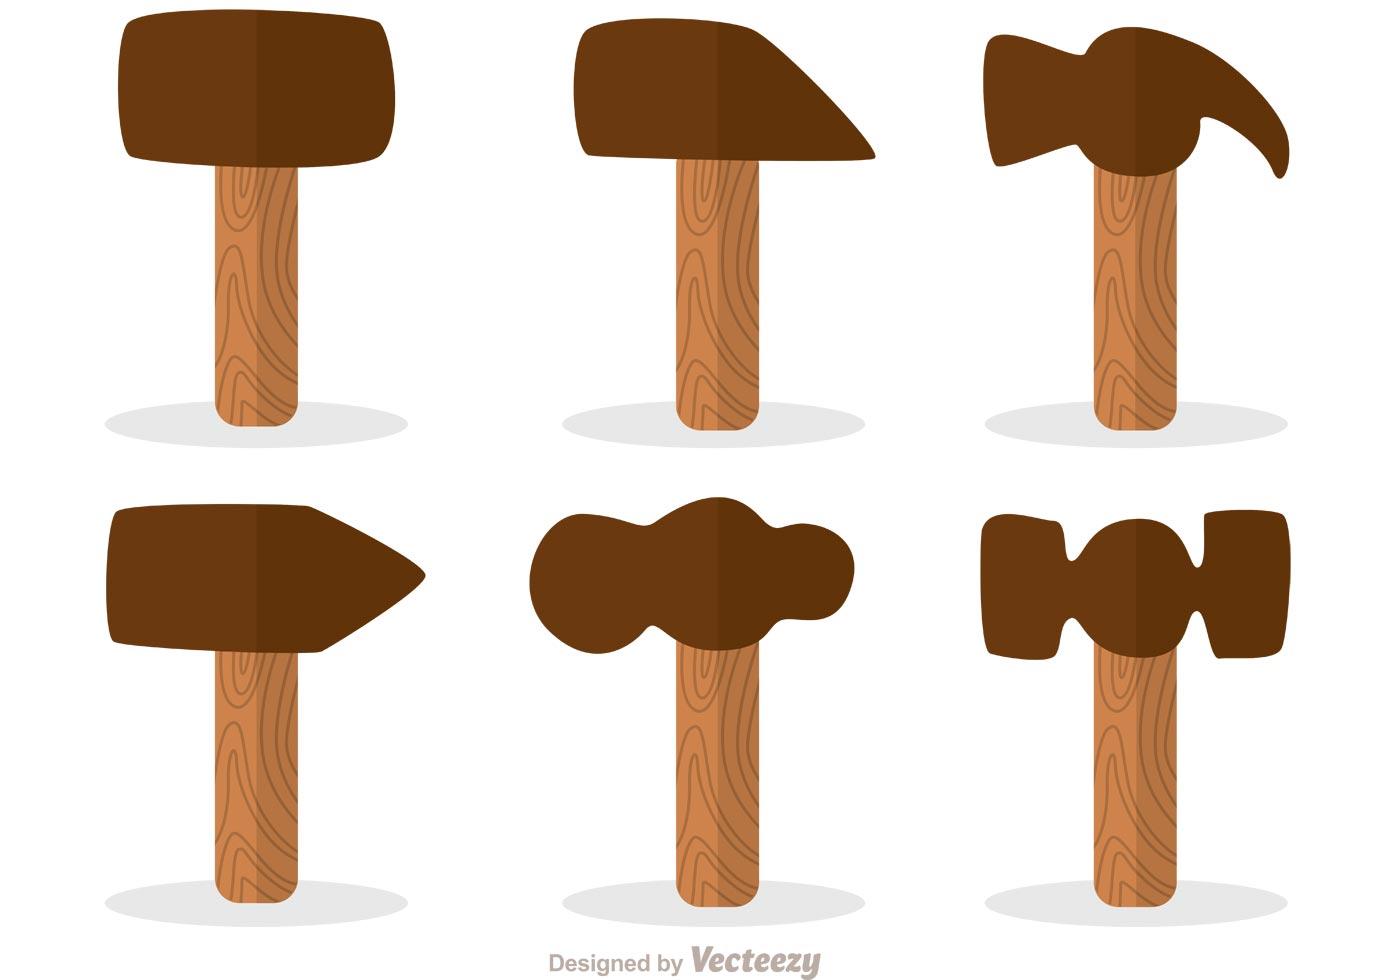 Vector Illustration Hammer: Hammer Flat Design Icons Vector Pack